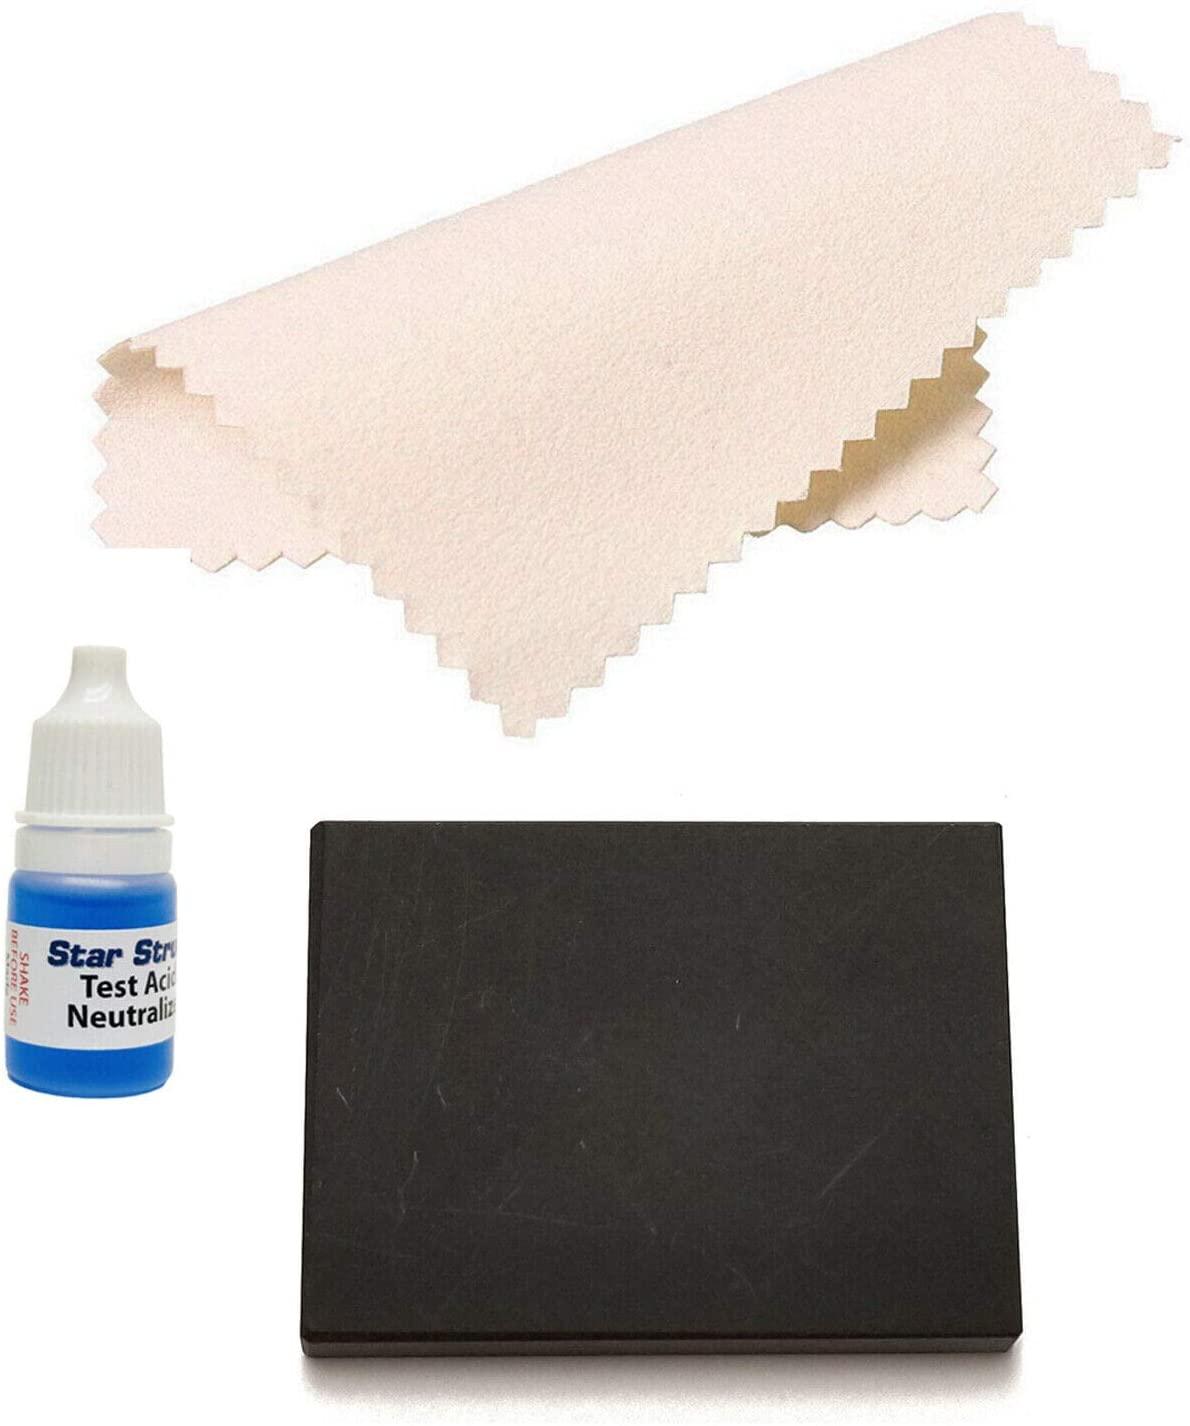 Gold Testing Kit Small Gold Testing Solution Stone w/Neutralizer & Polishing Cloth